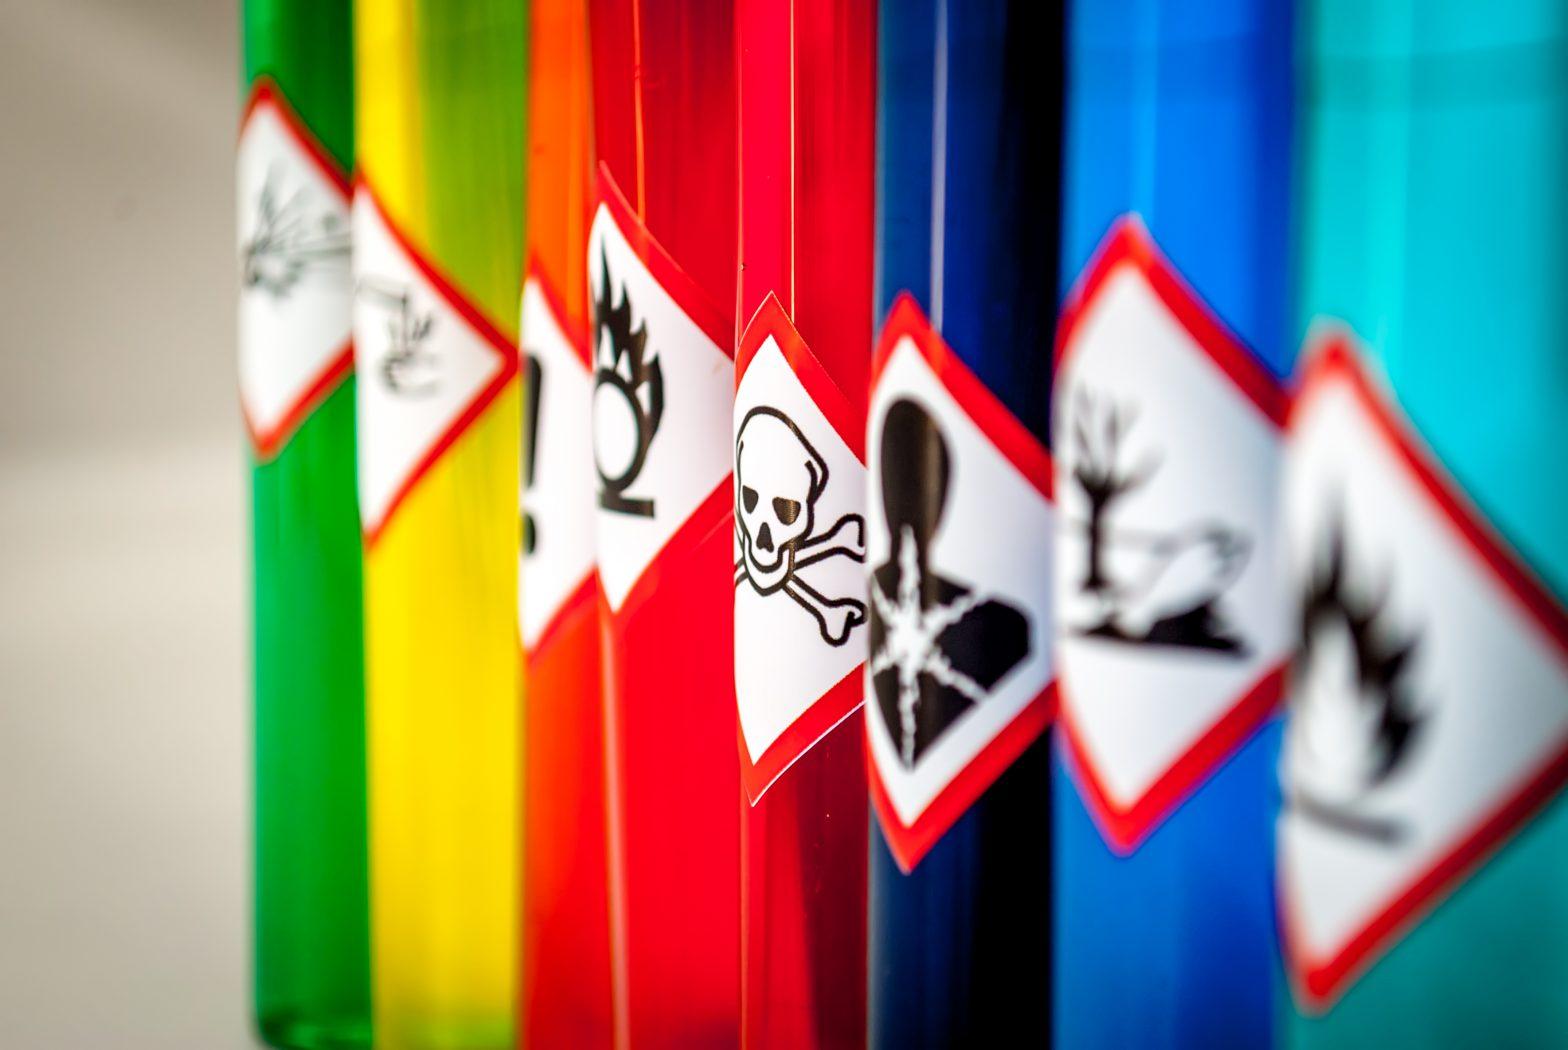 Chemical-hazard-pictograms-Toxic-focus